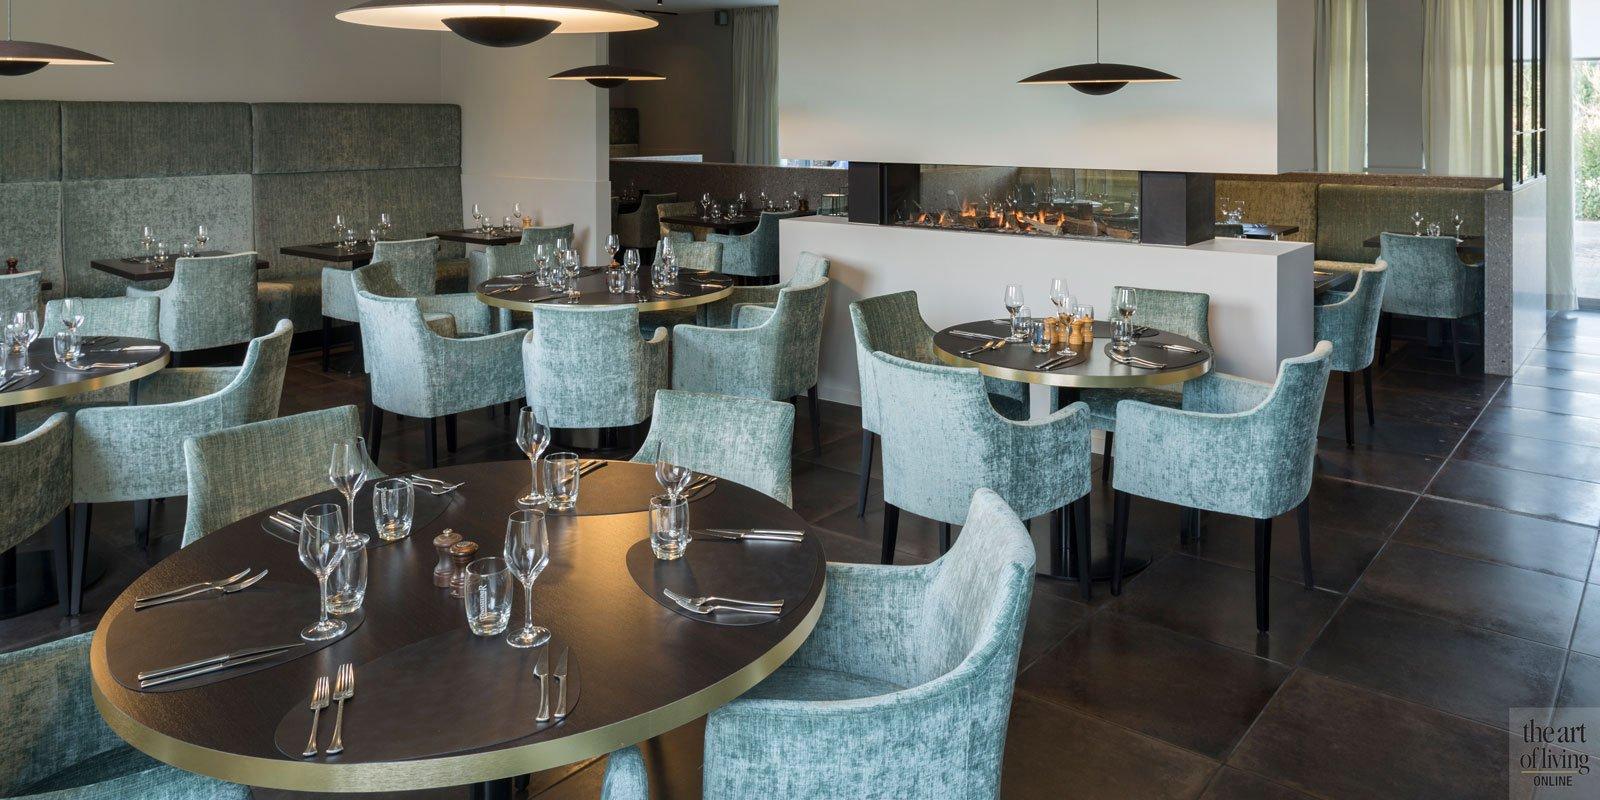 Restaurant Chaflo & Co, Bouw-iD